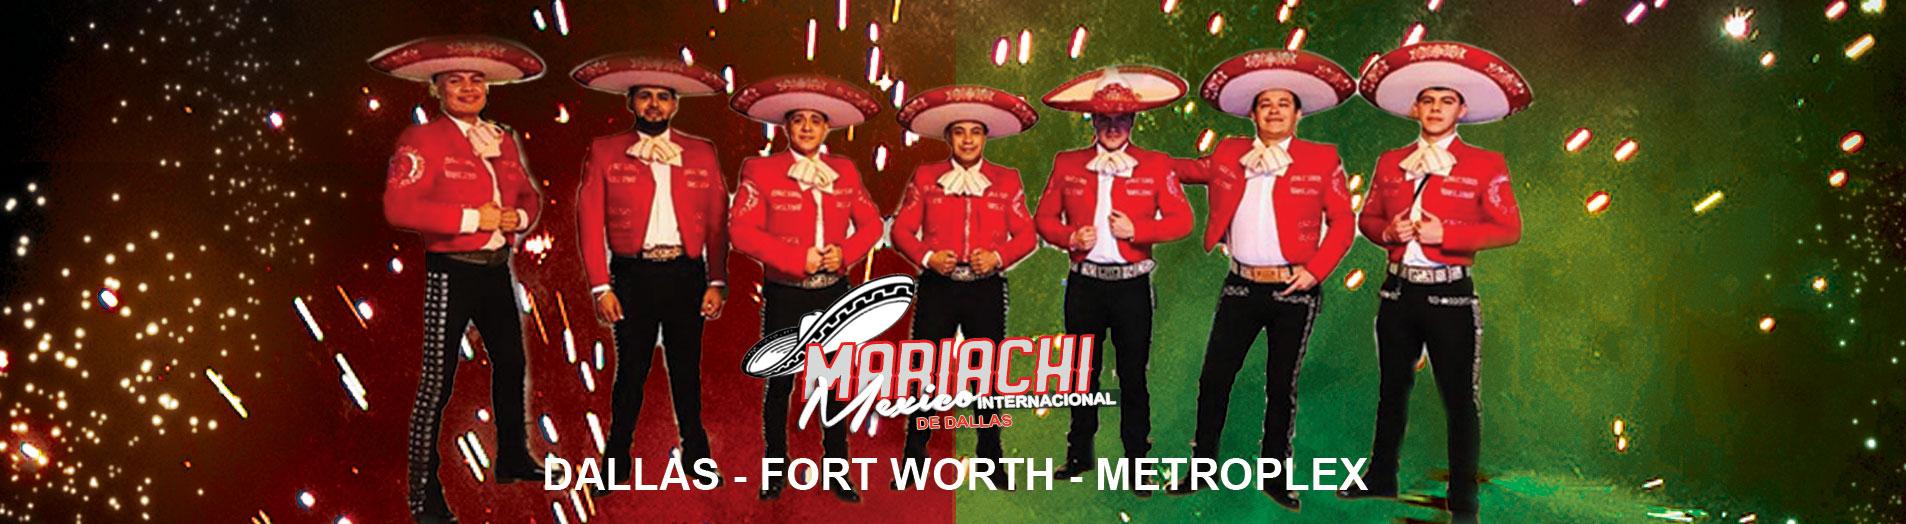 mariachi-band-dallas-texas